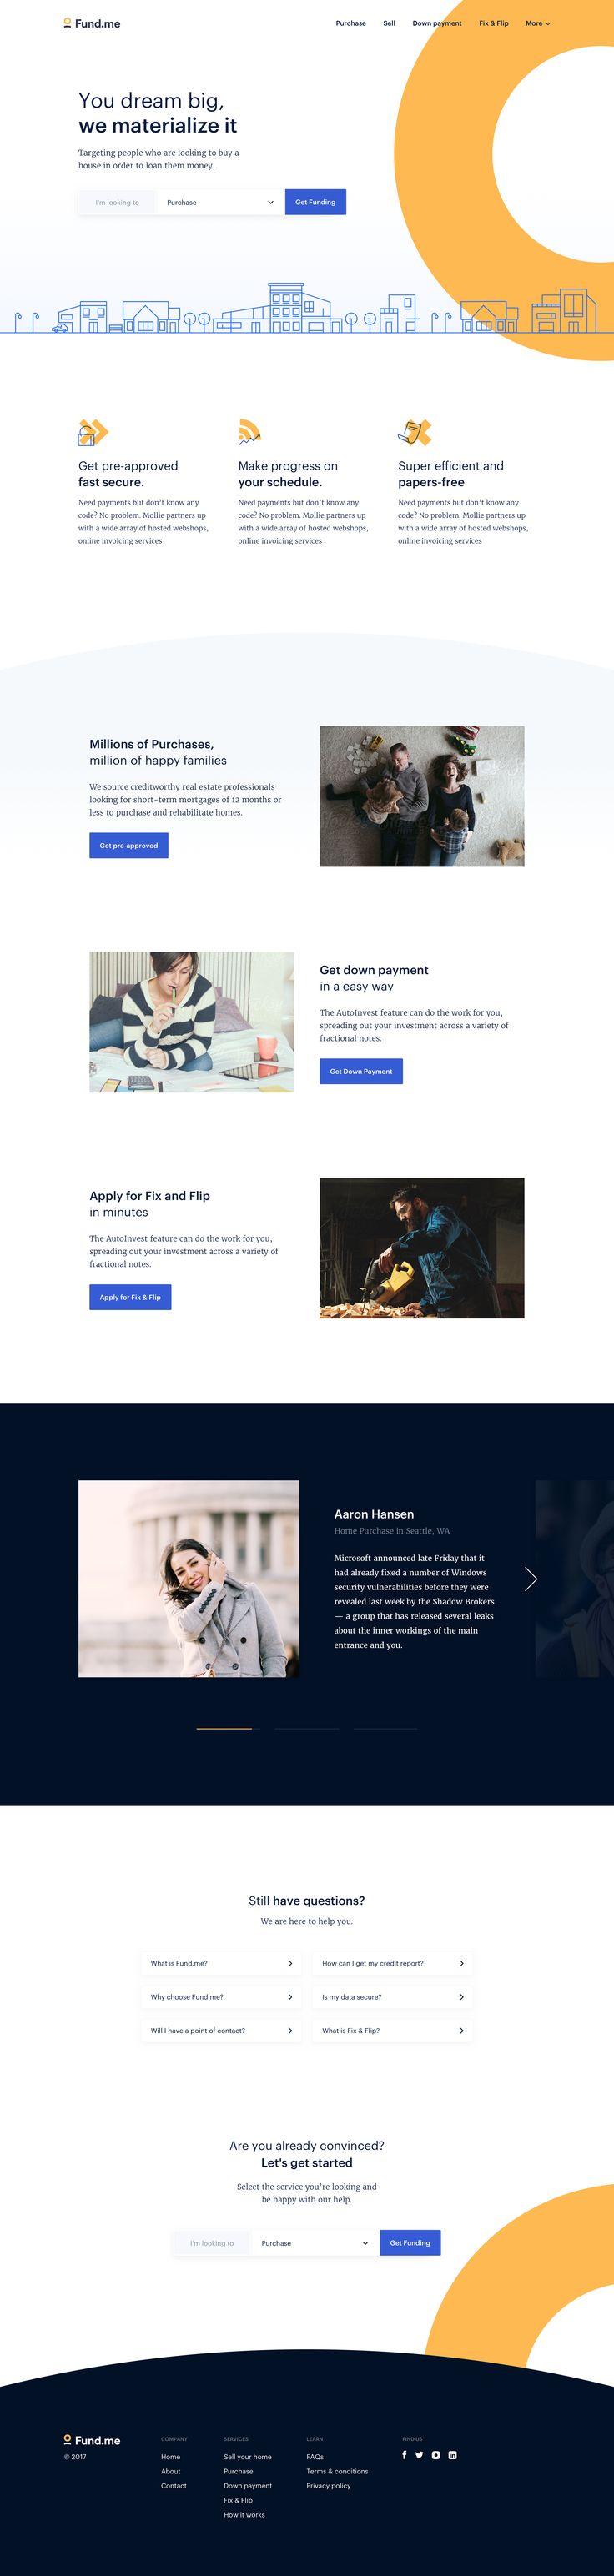 Fund.me homepage 2x